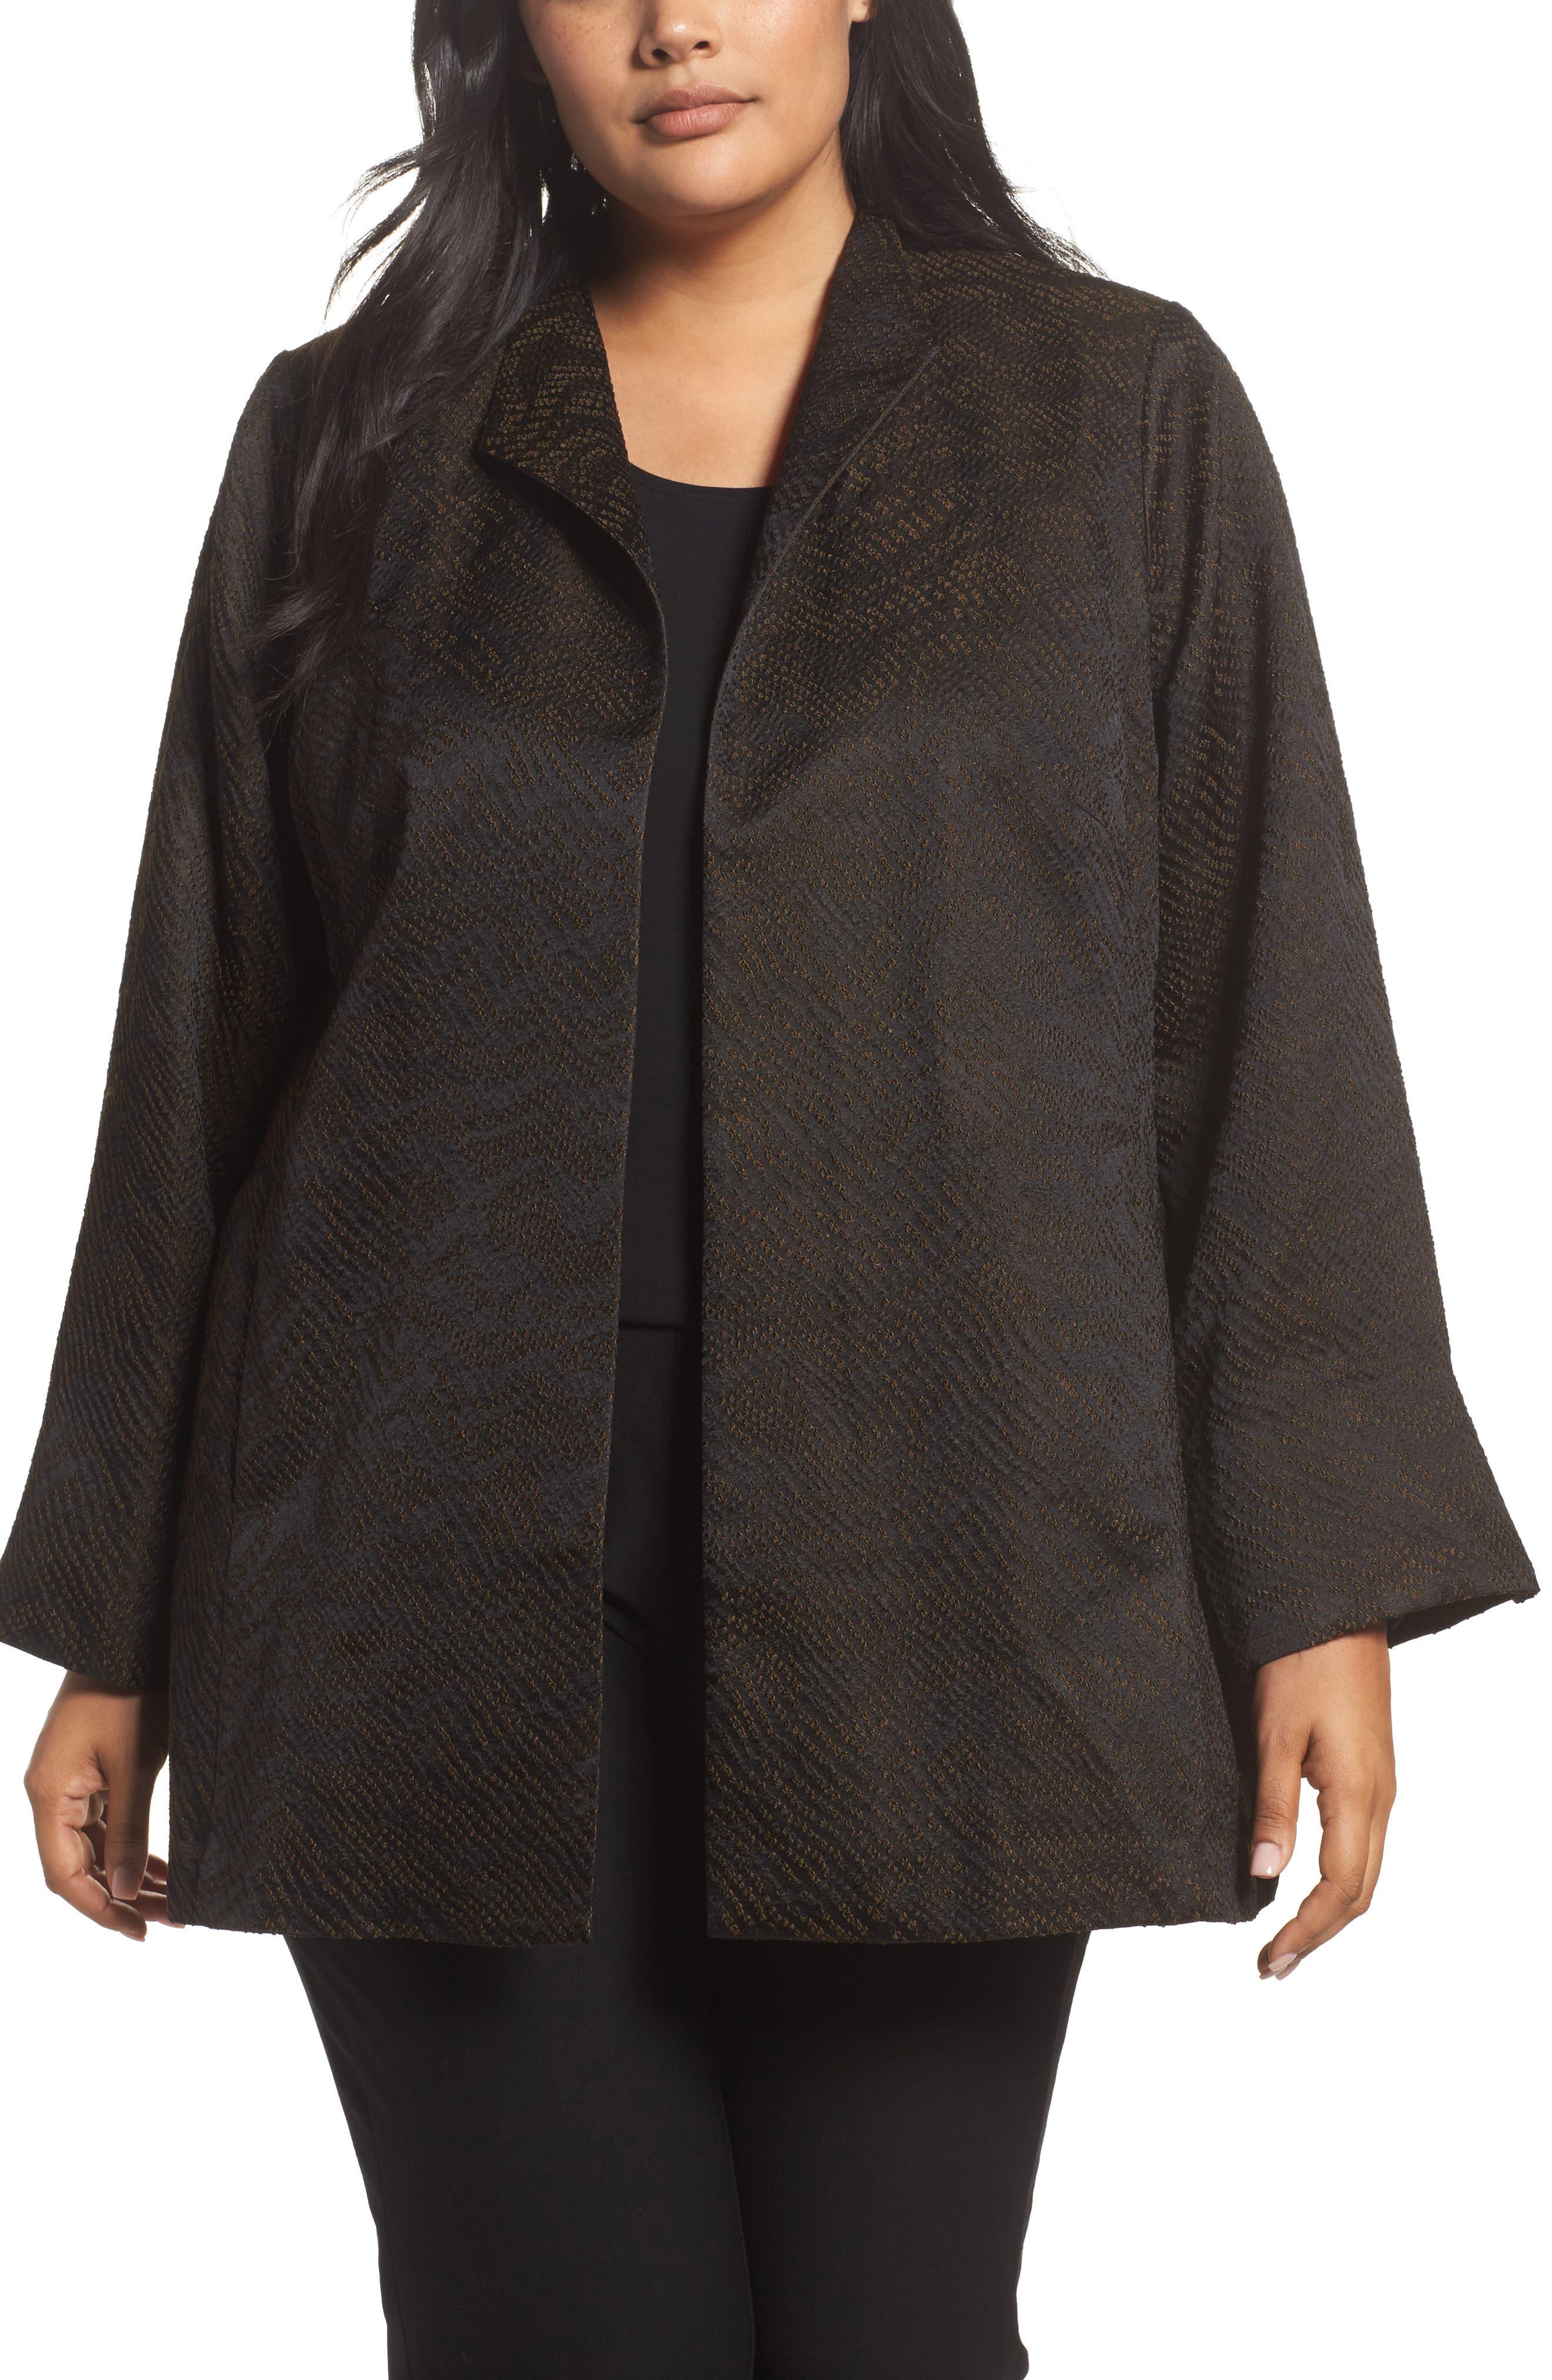 Eileen Fisher Silk Blend Jacquard Jacket (Plus Size)